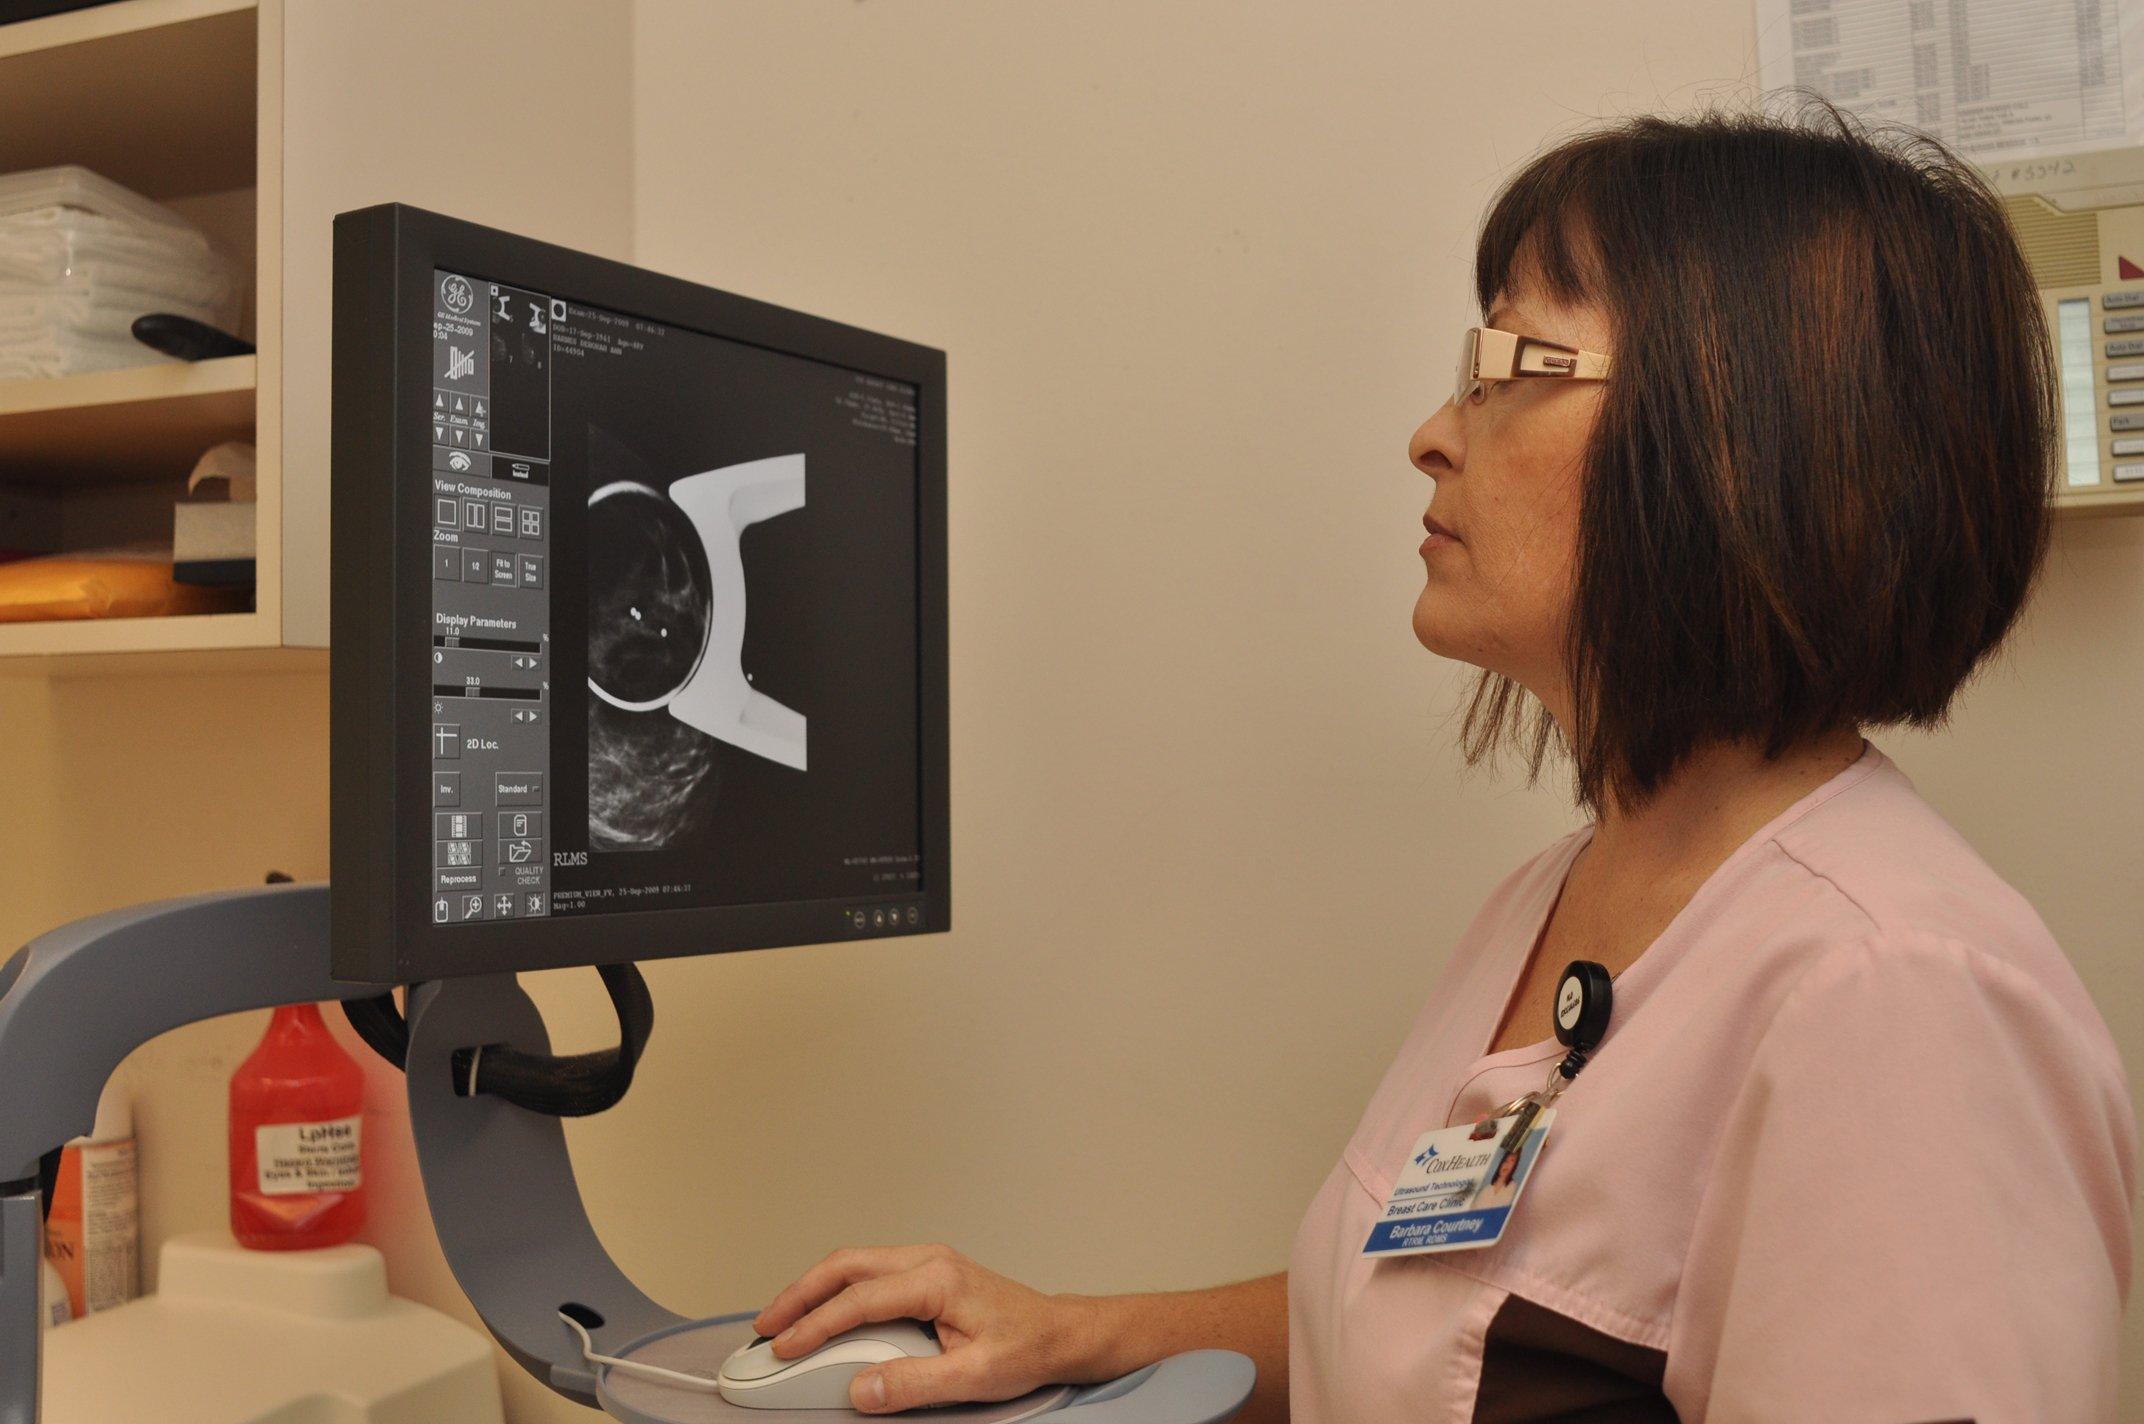 A CoxHealth nurse views an 3D mammography image.